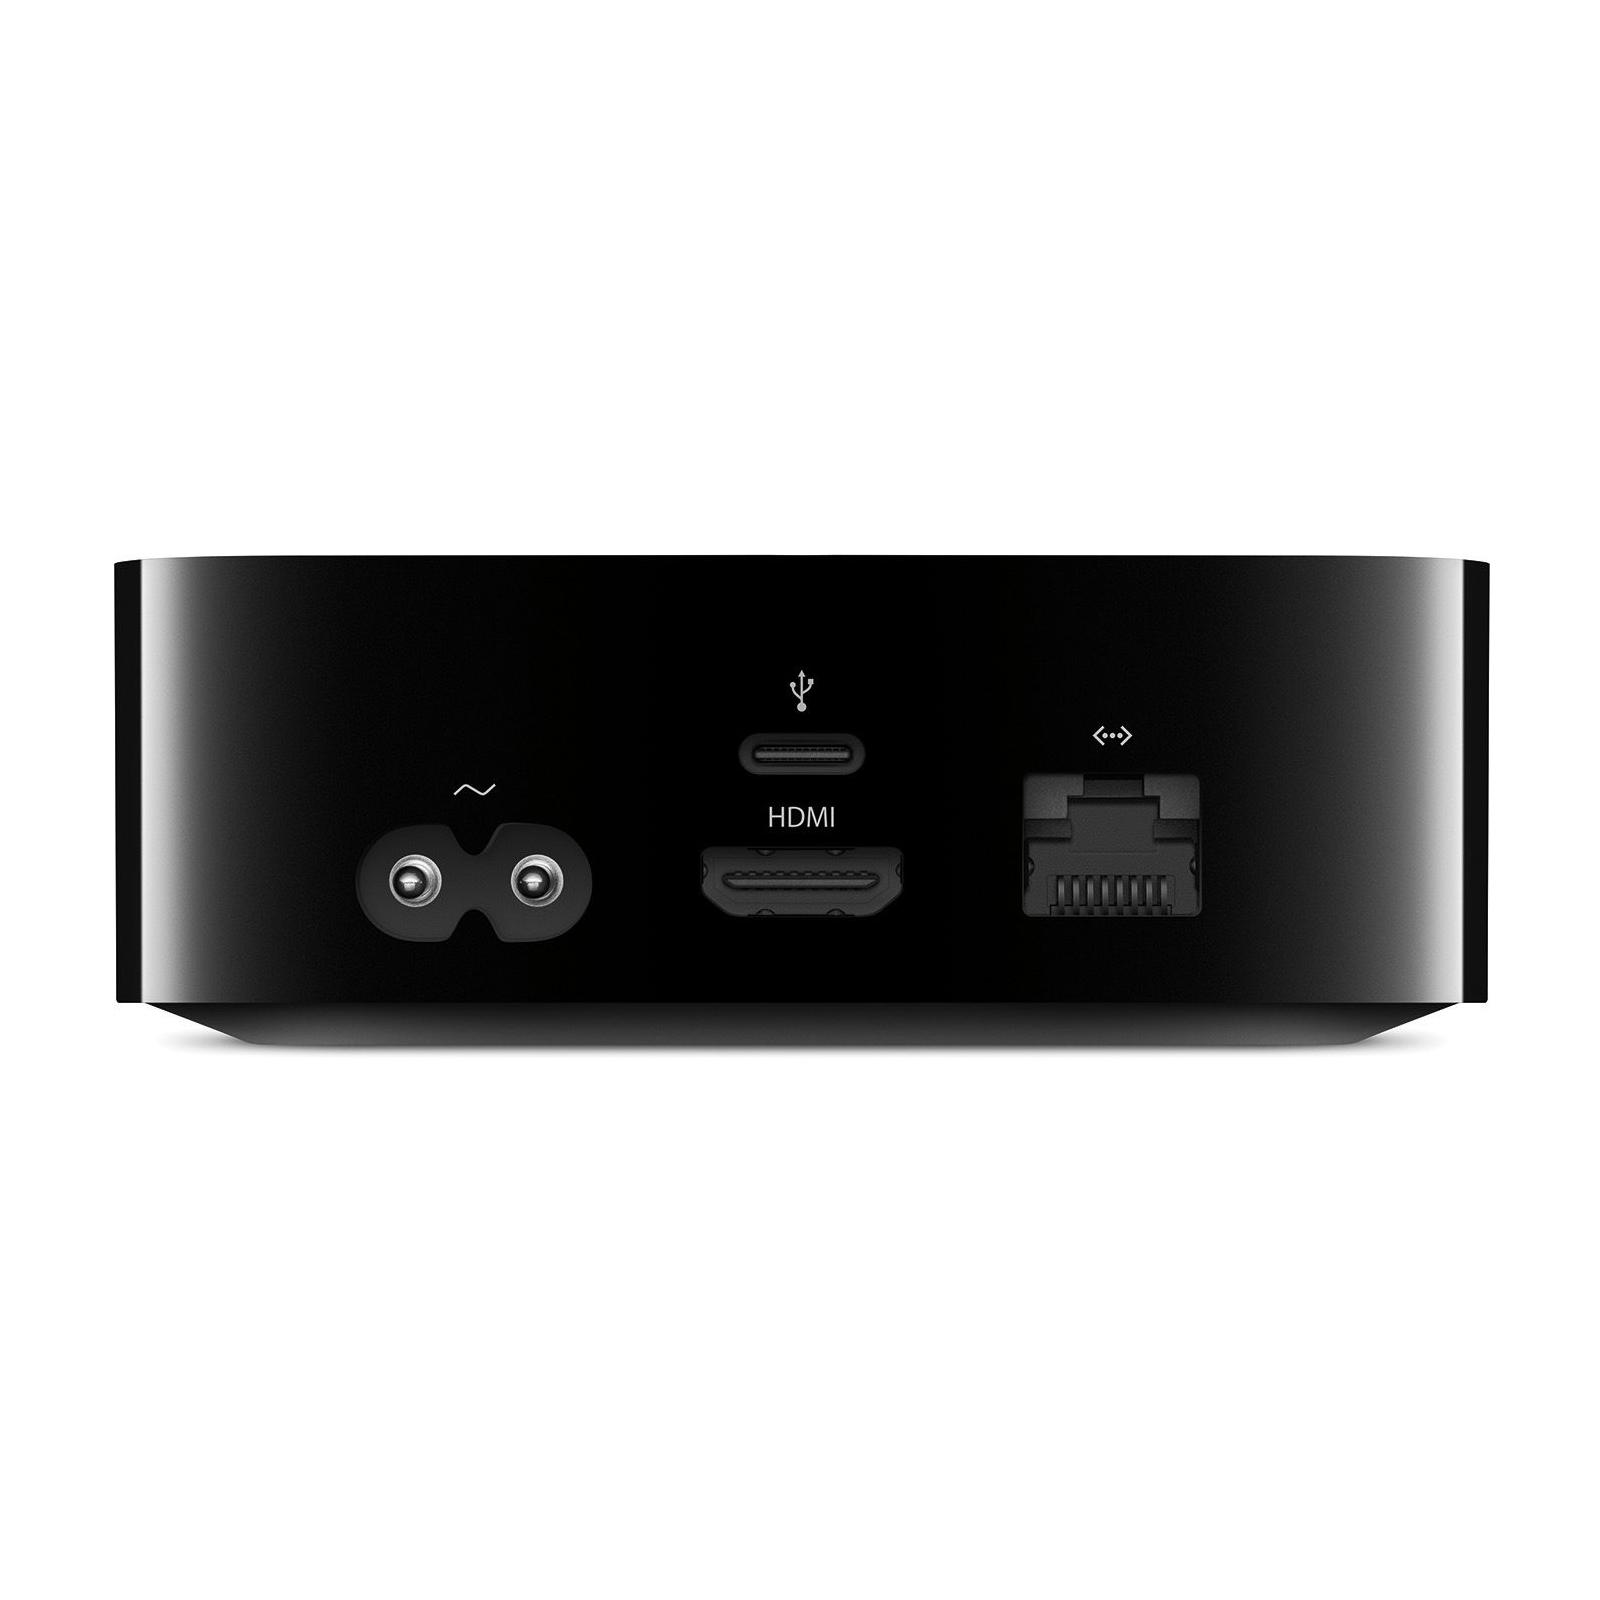 Медиаплеер Apple TV A1625 64GB (MLNC2RS/A) изображение 4